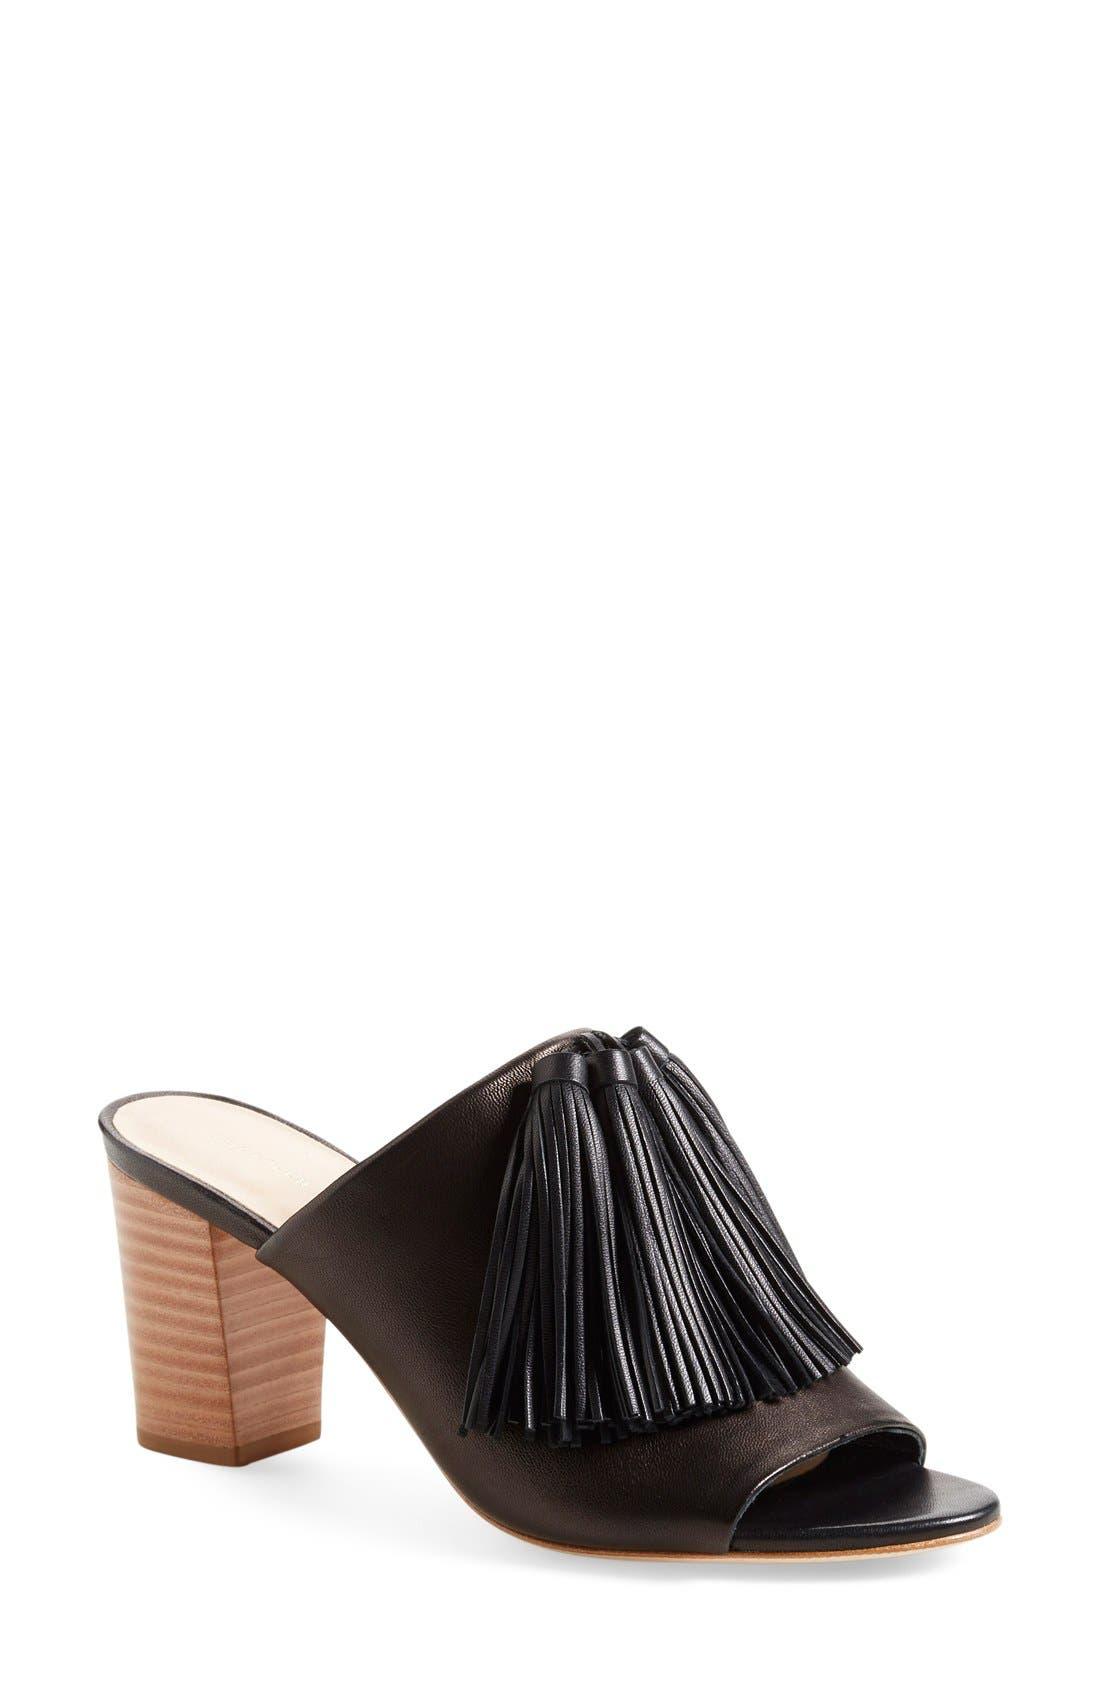 Main Image - Loeffler Randall Clo Tassel Mule Sandal